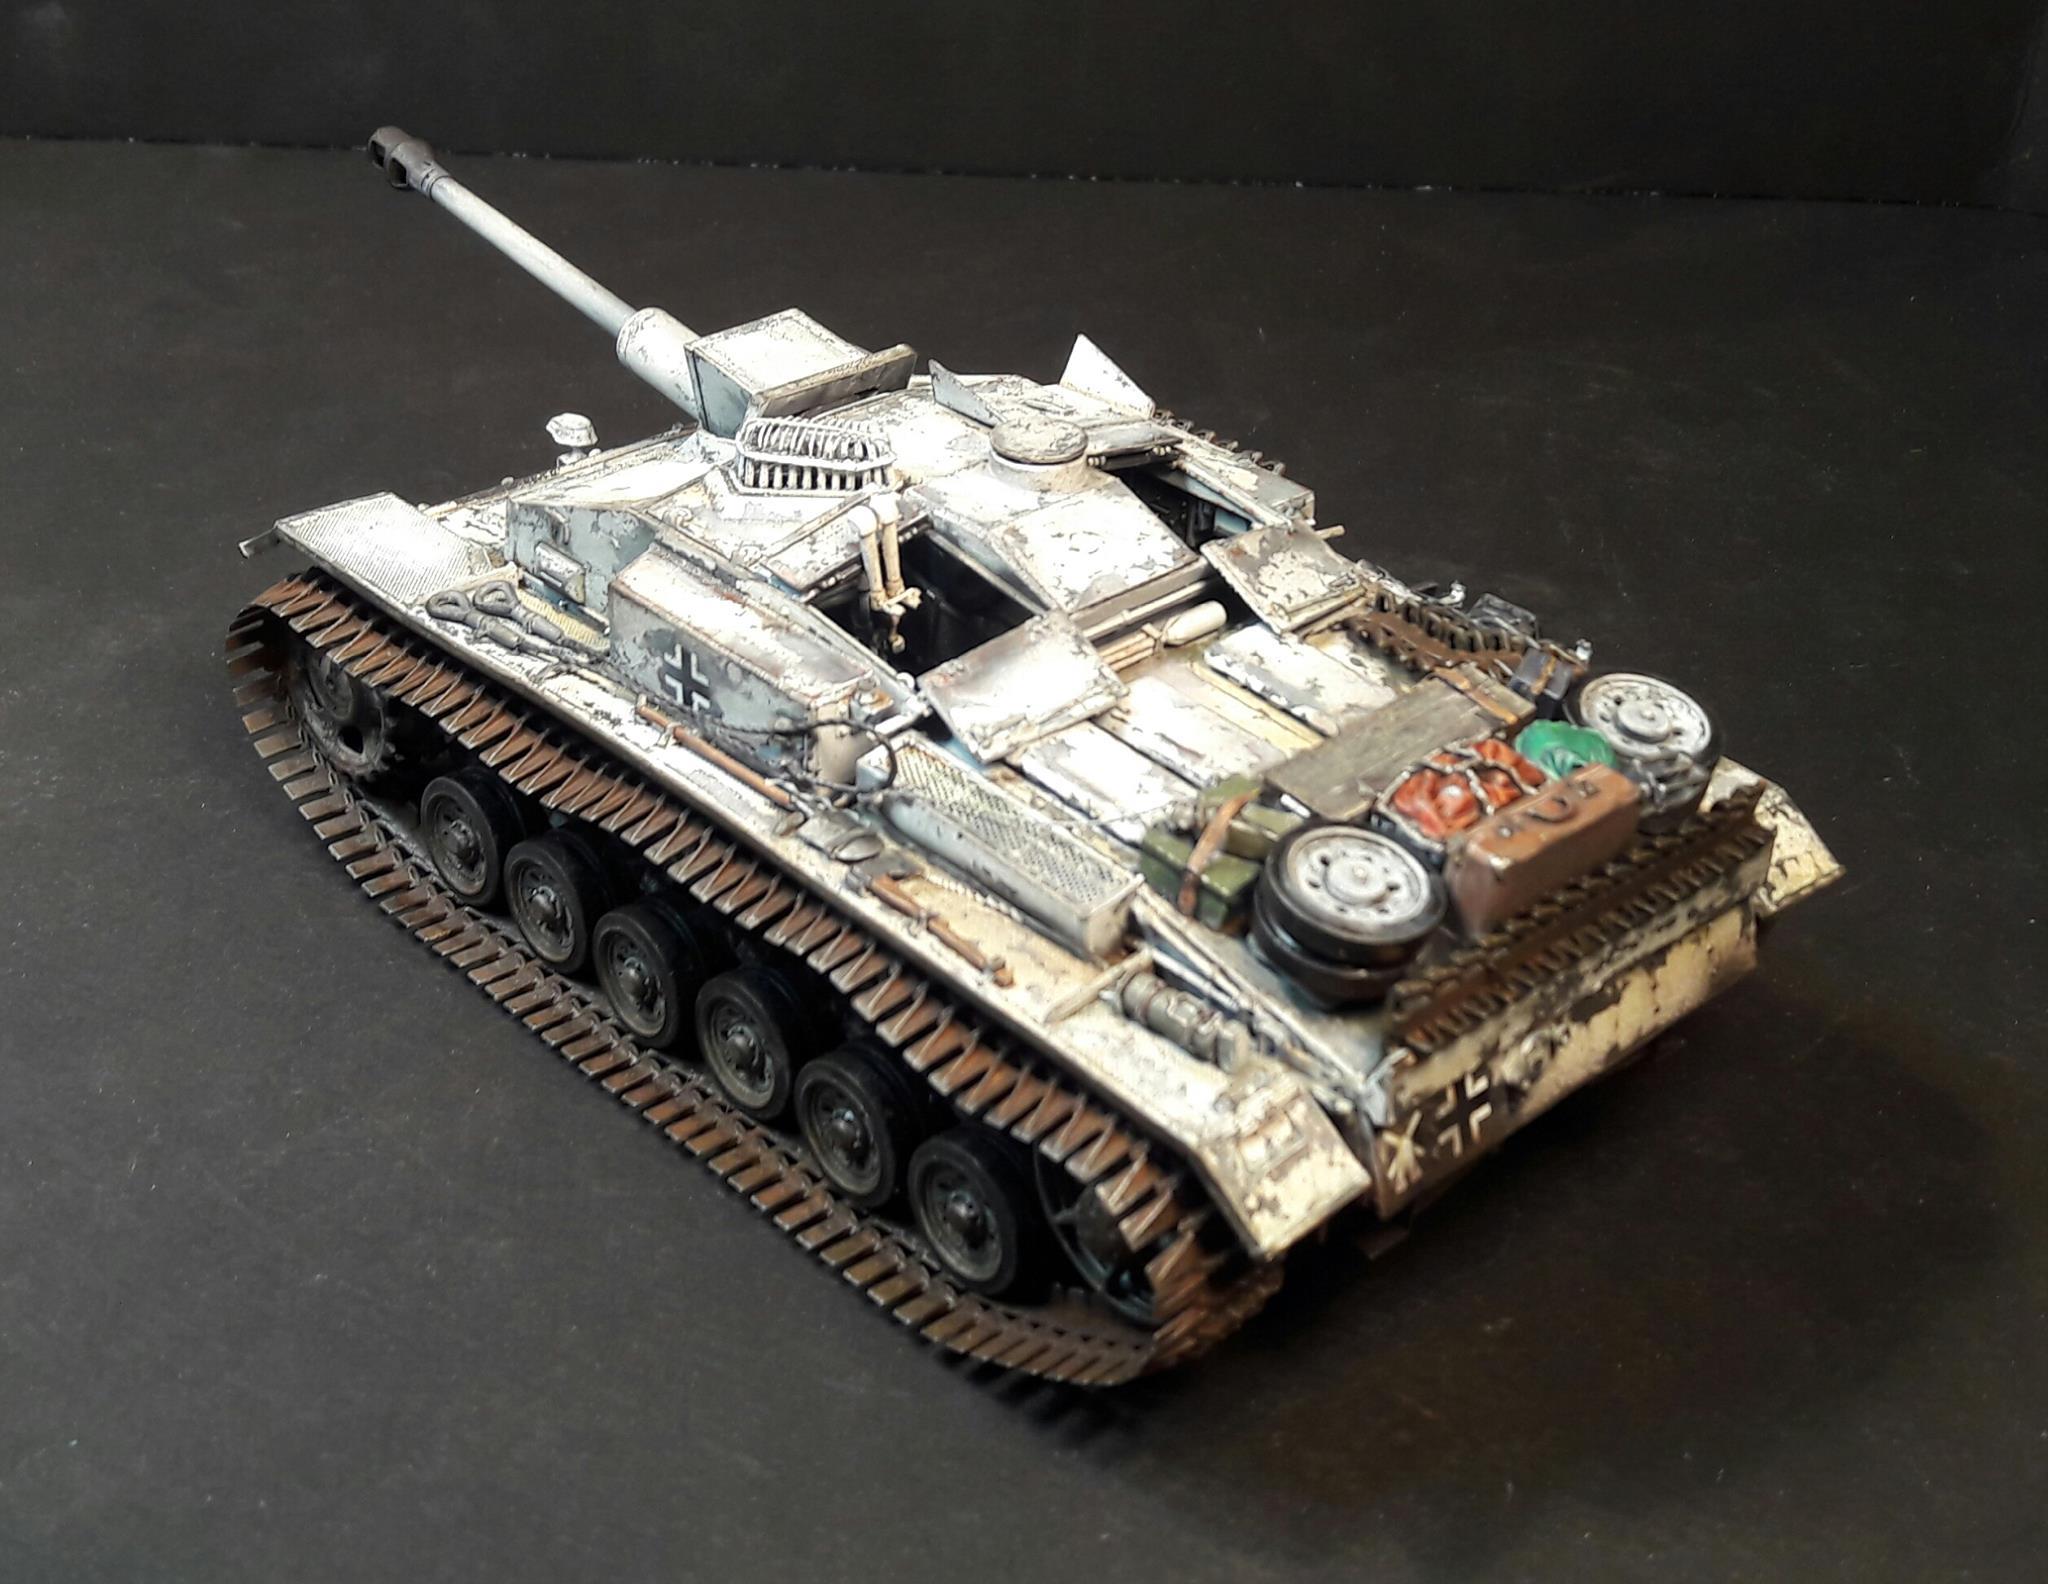 StuG.III Ausf.F/8 late production w/Winterketten - 1/35 - Page 2 93445620906939102120985104325631472519779o